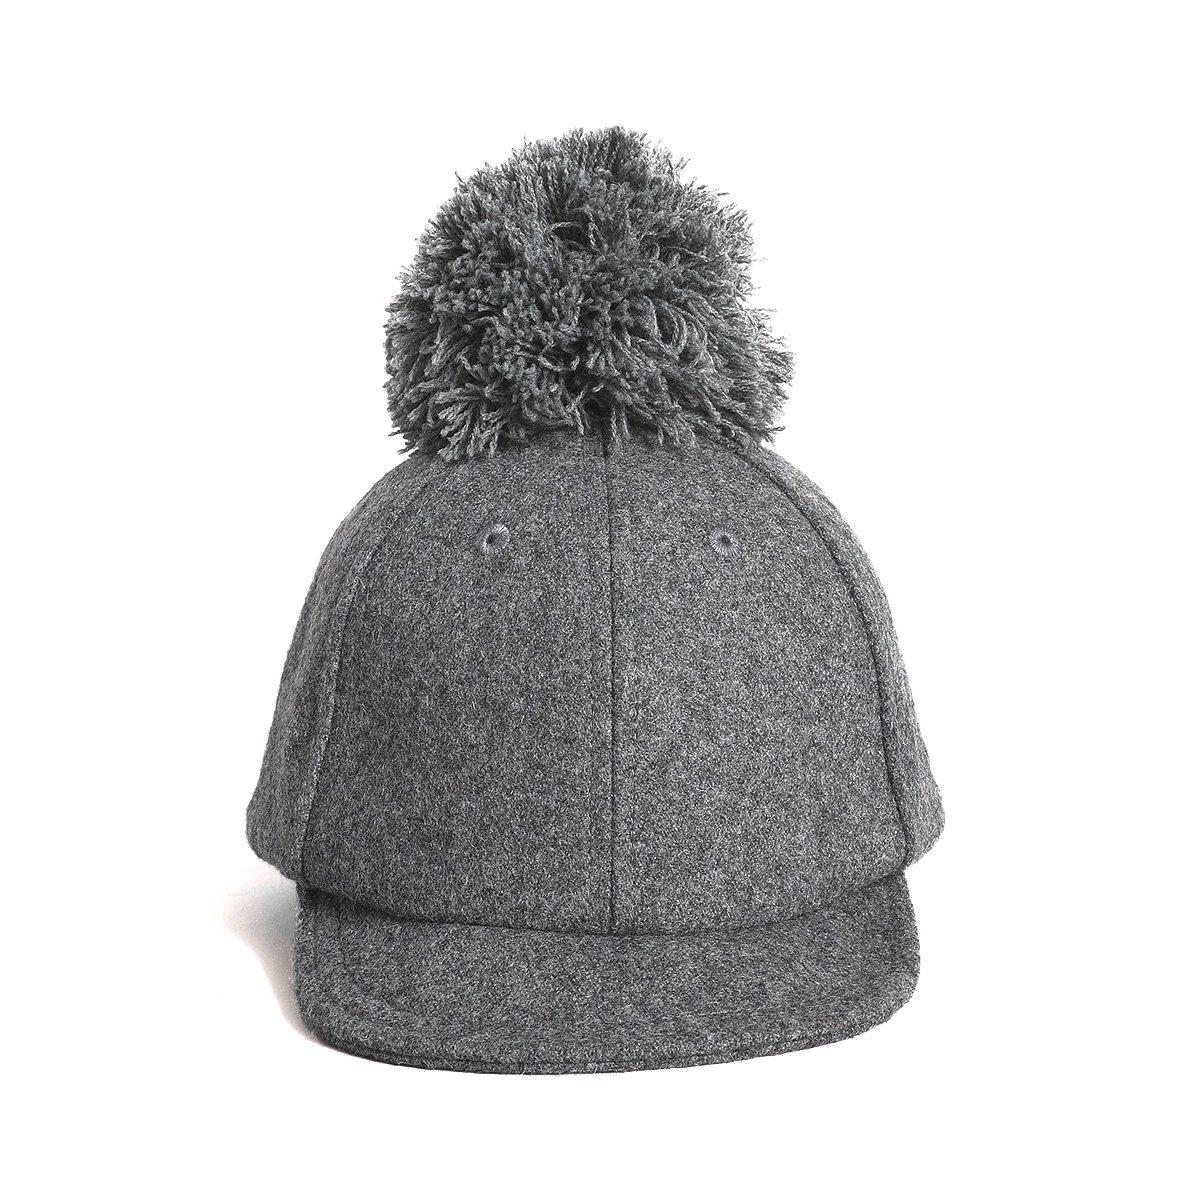 【KIDS】Wool Pom Cap 2 詳細画像2